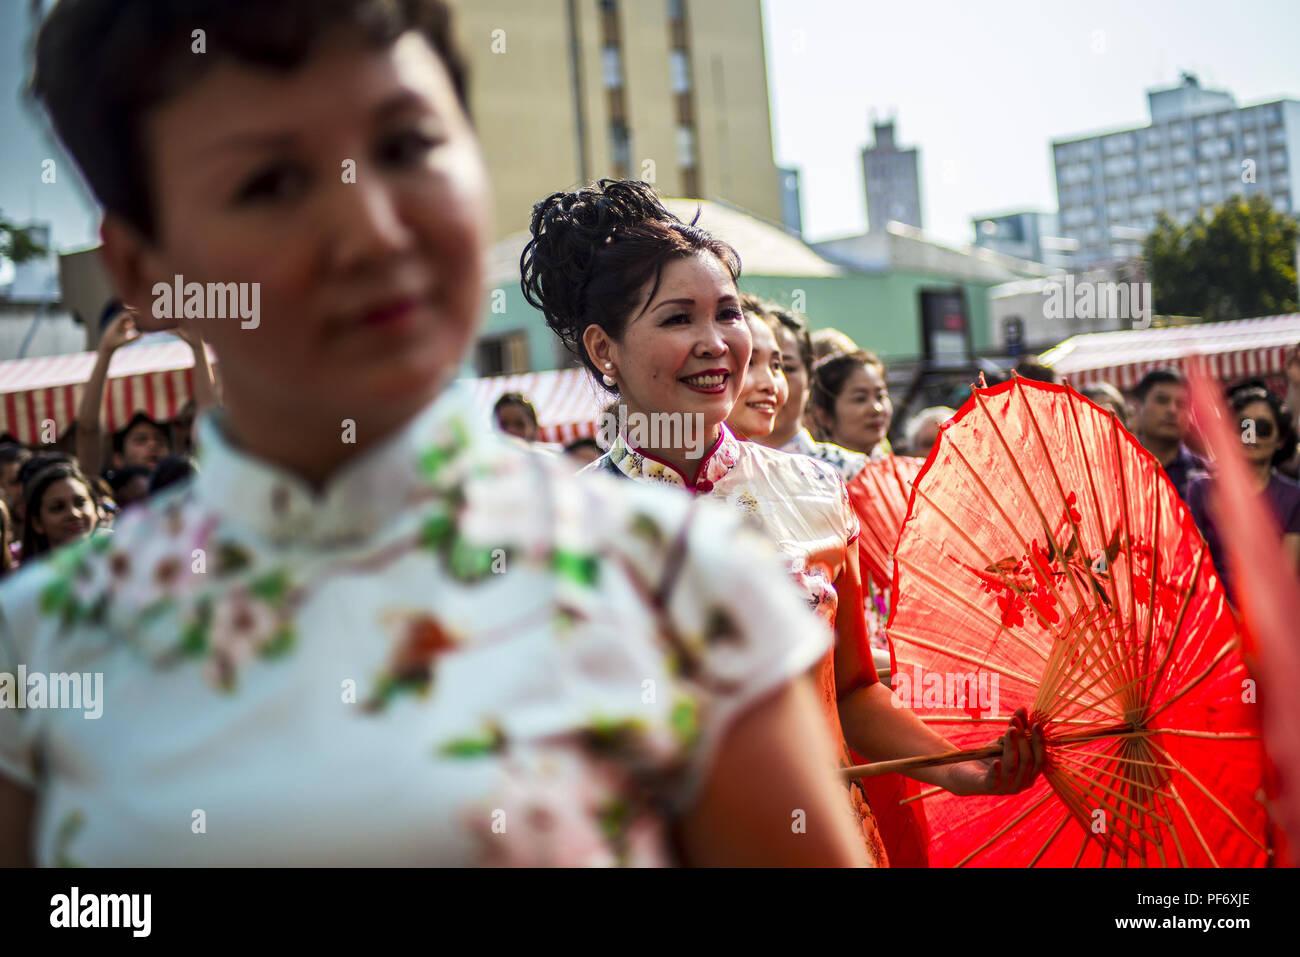 Latin Inspired Immagini   Latin Inspired Fotos Stock - Alamy fe70397d0d6